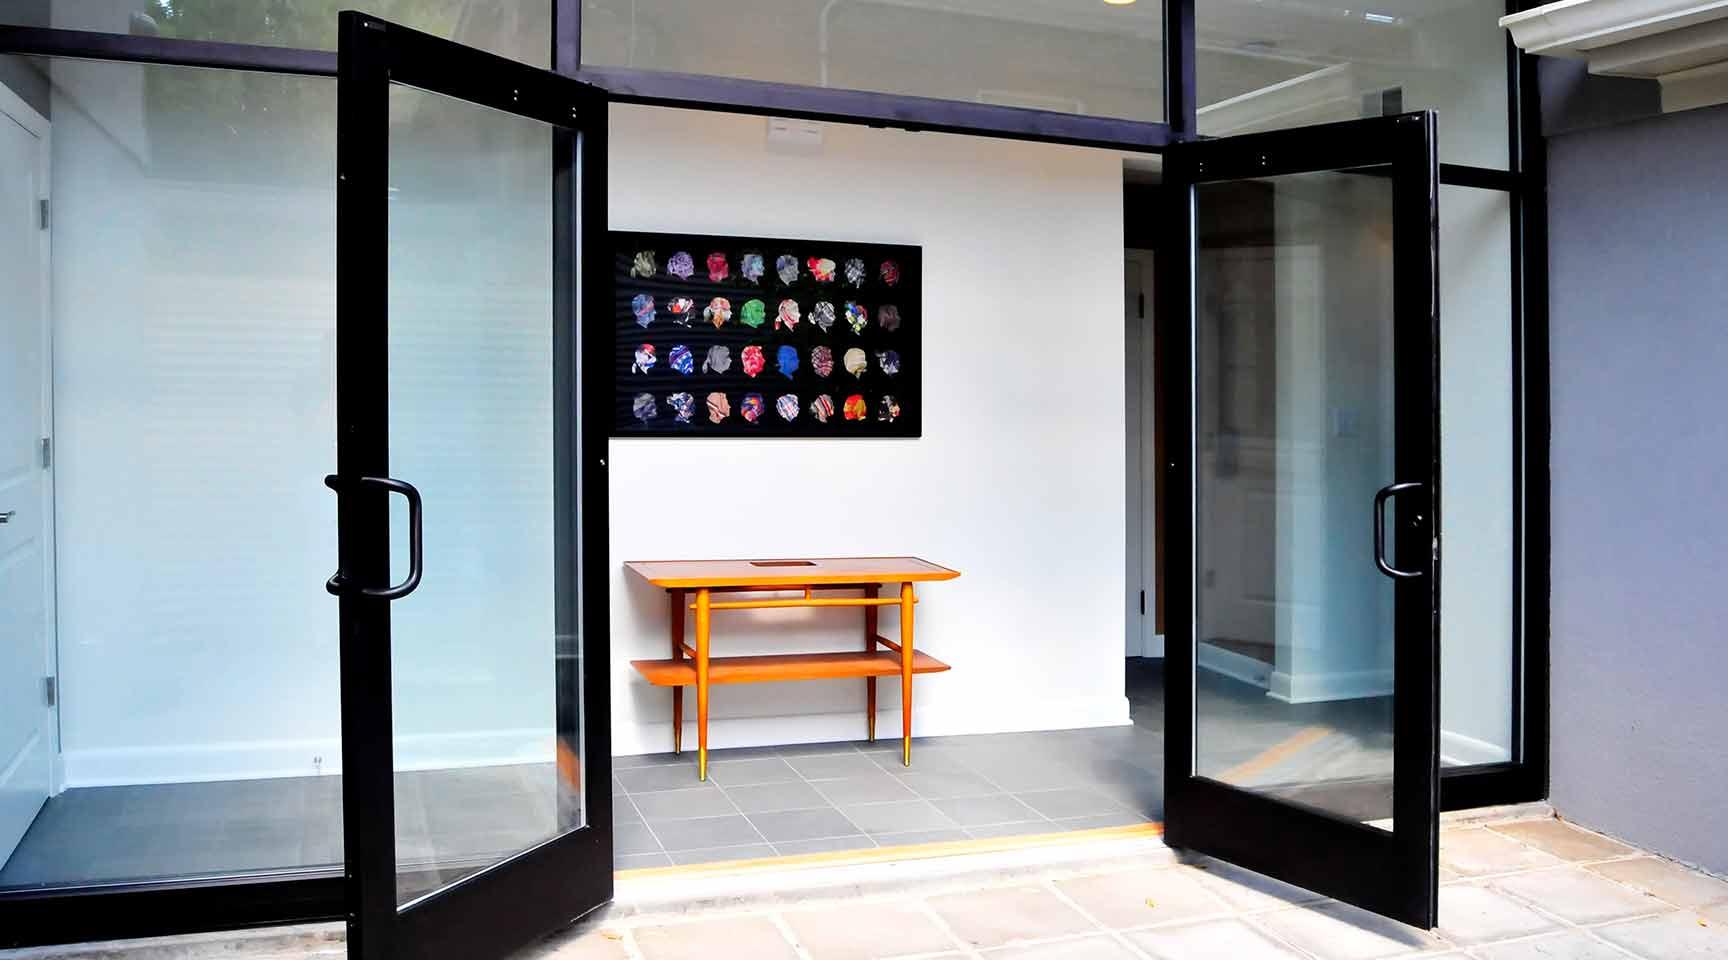 100 Modern Minimalism Joy From Snaidero Modern Minimalism At Its Functional Best Small